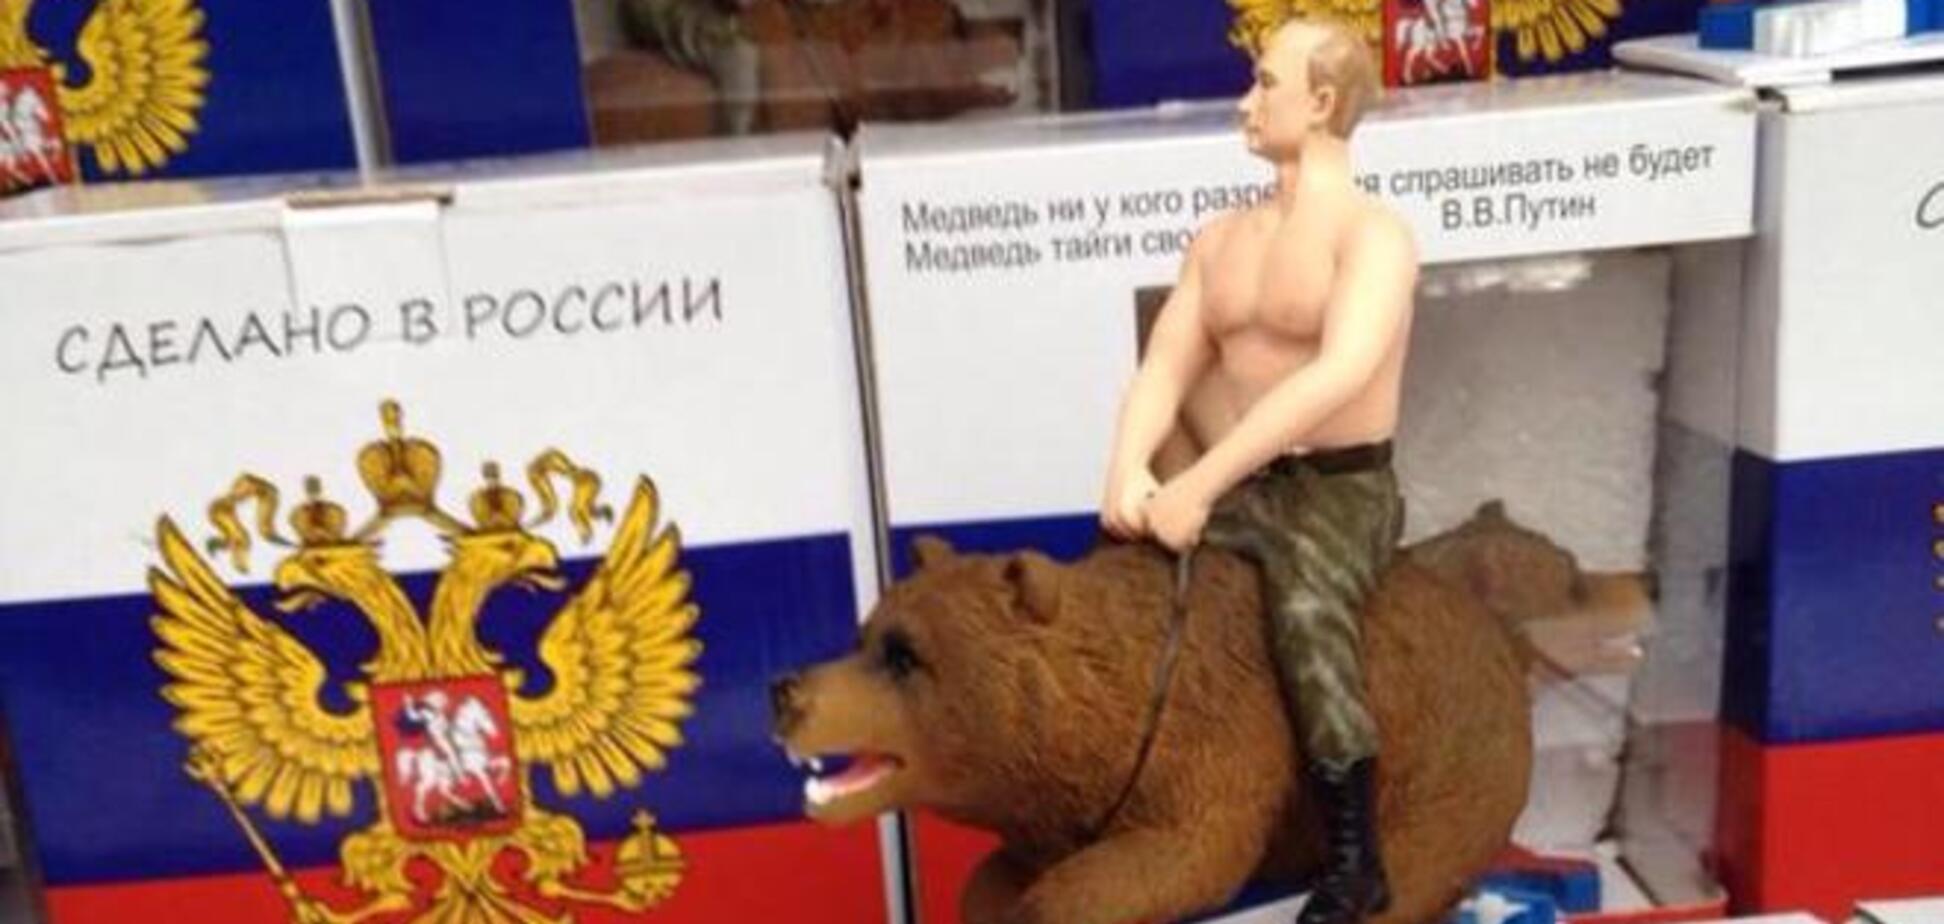 В России продают голого Путина на медведе: фотофакт